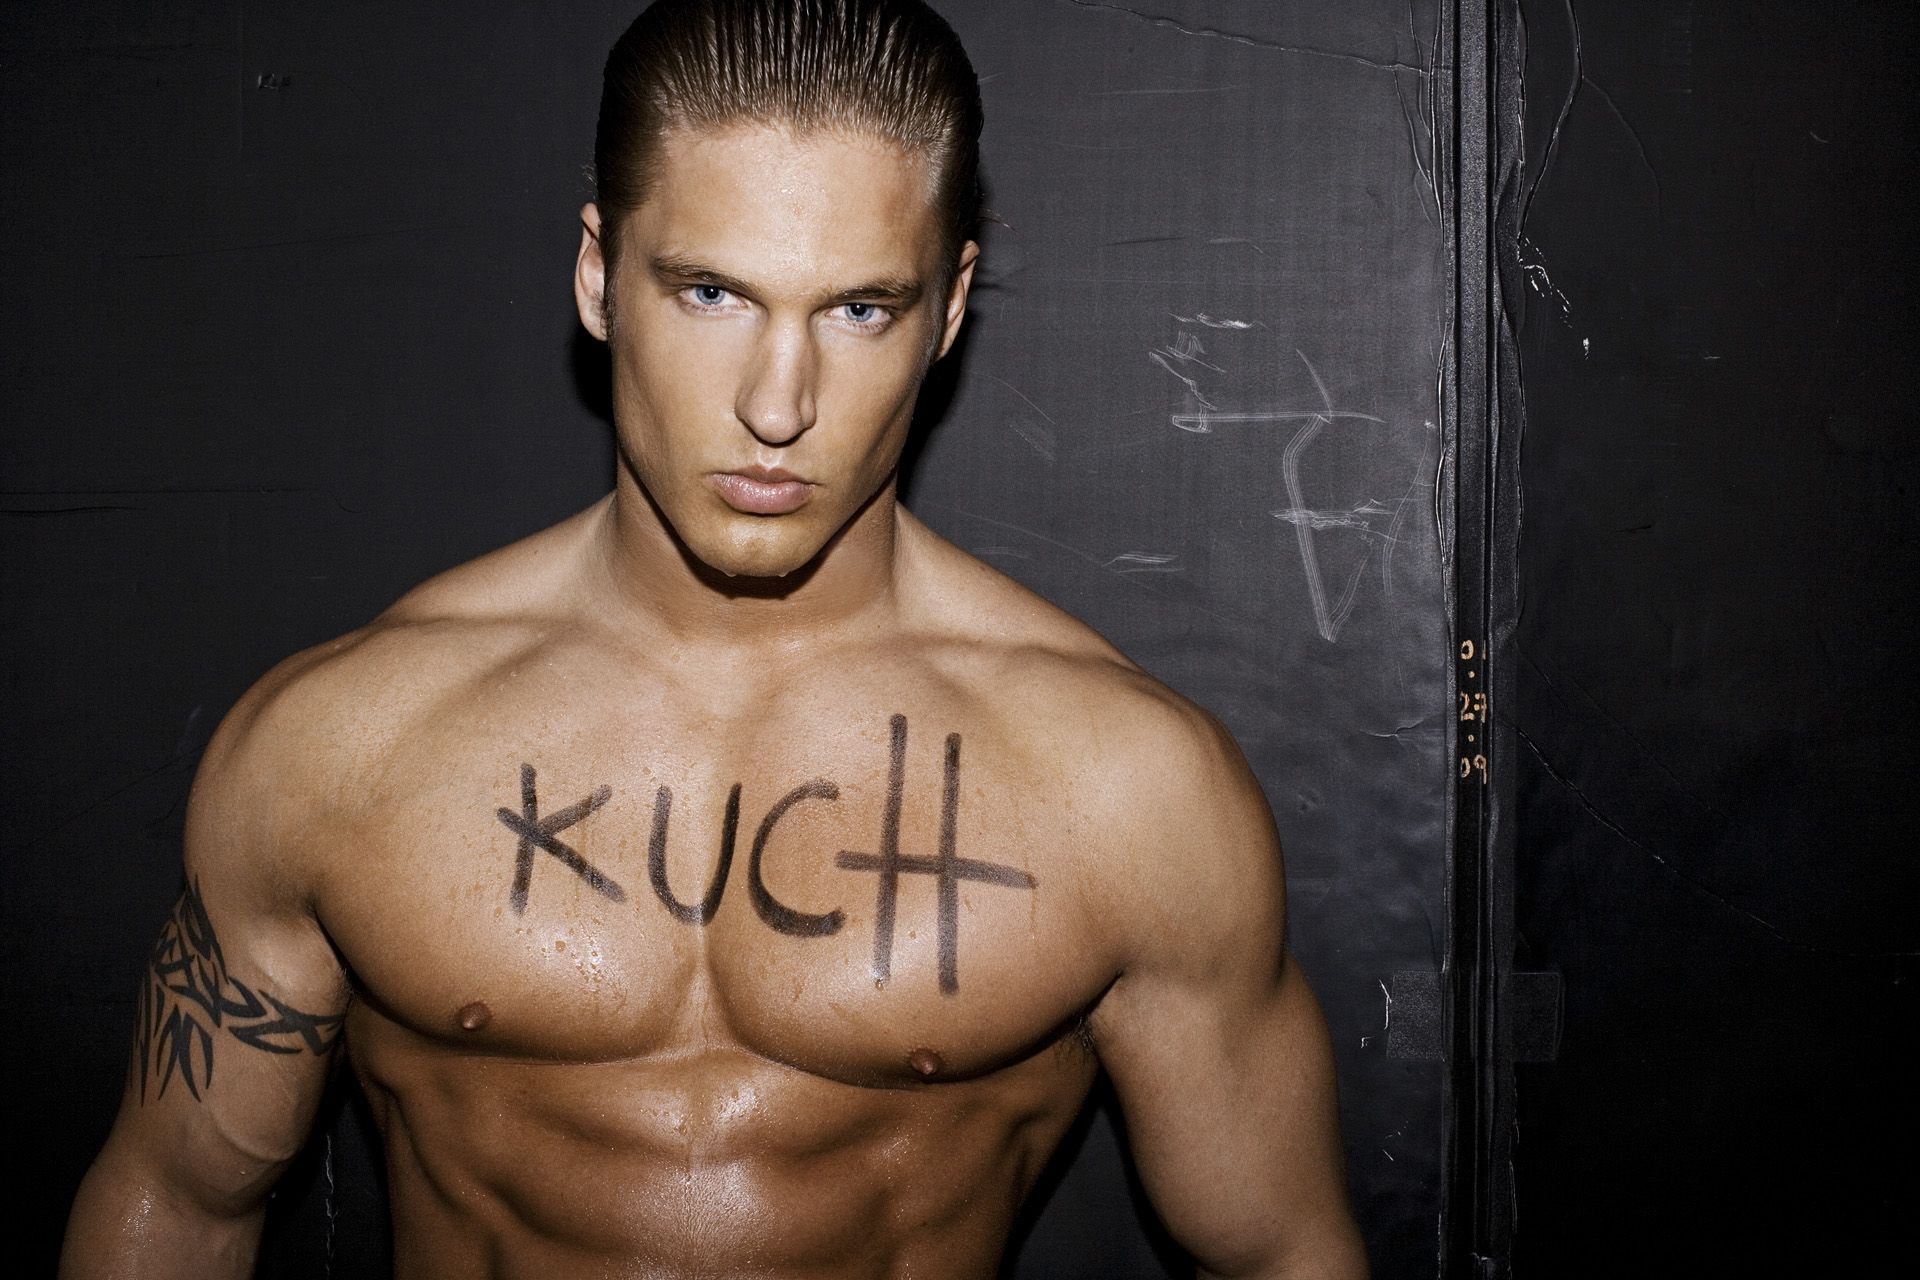 Remarkable, this steve kuchinsky male model what, look